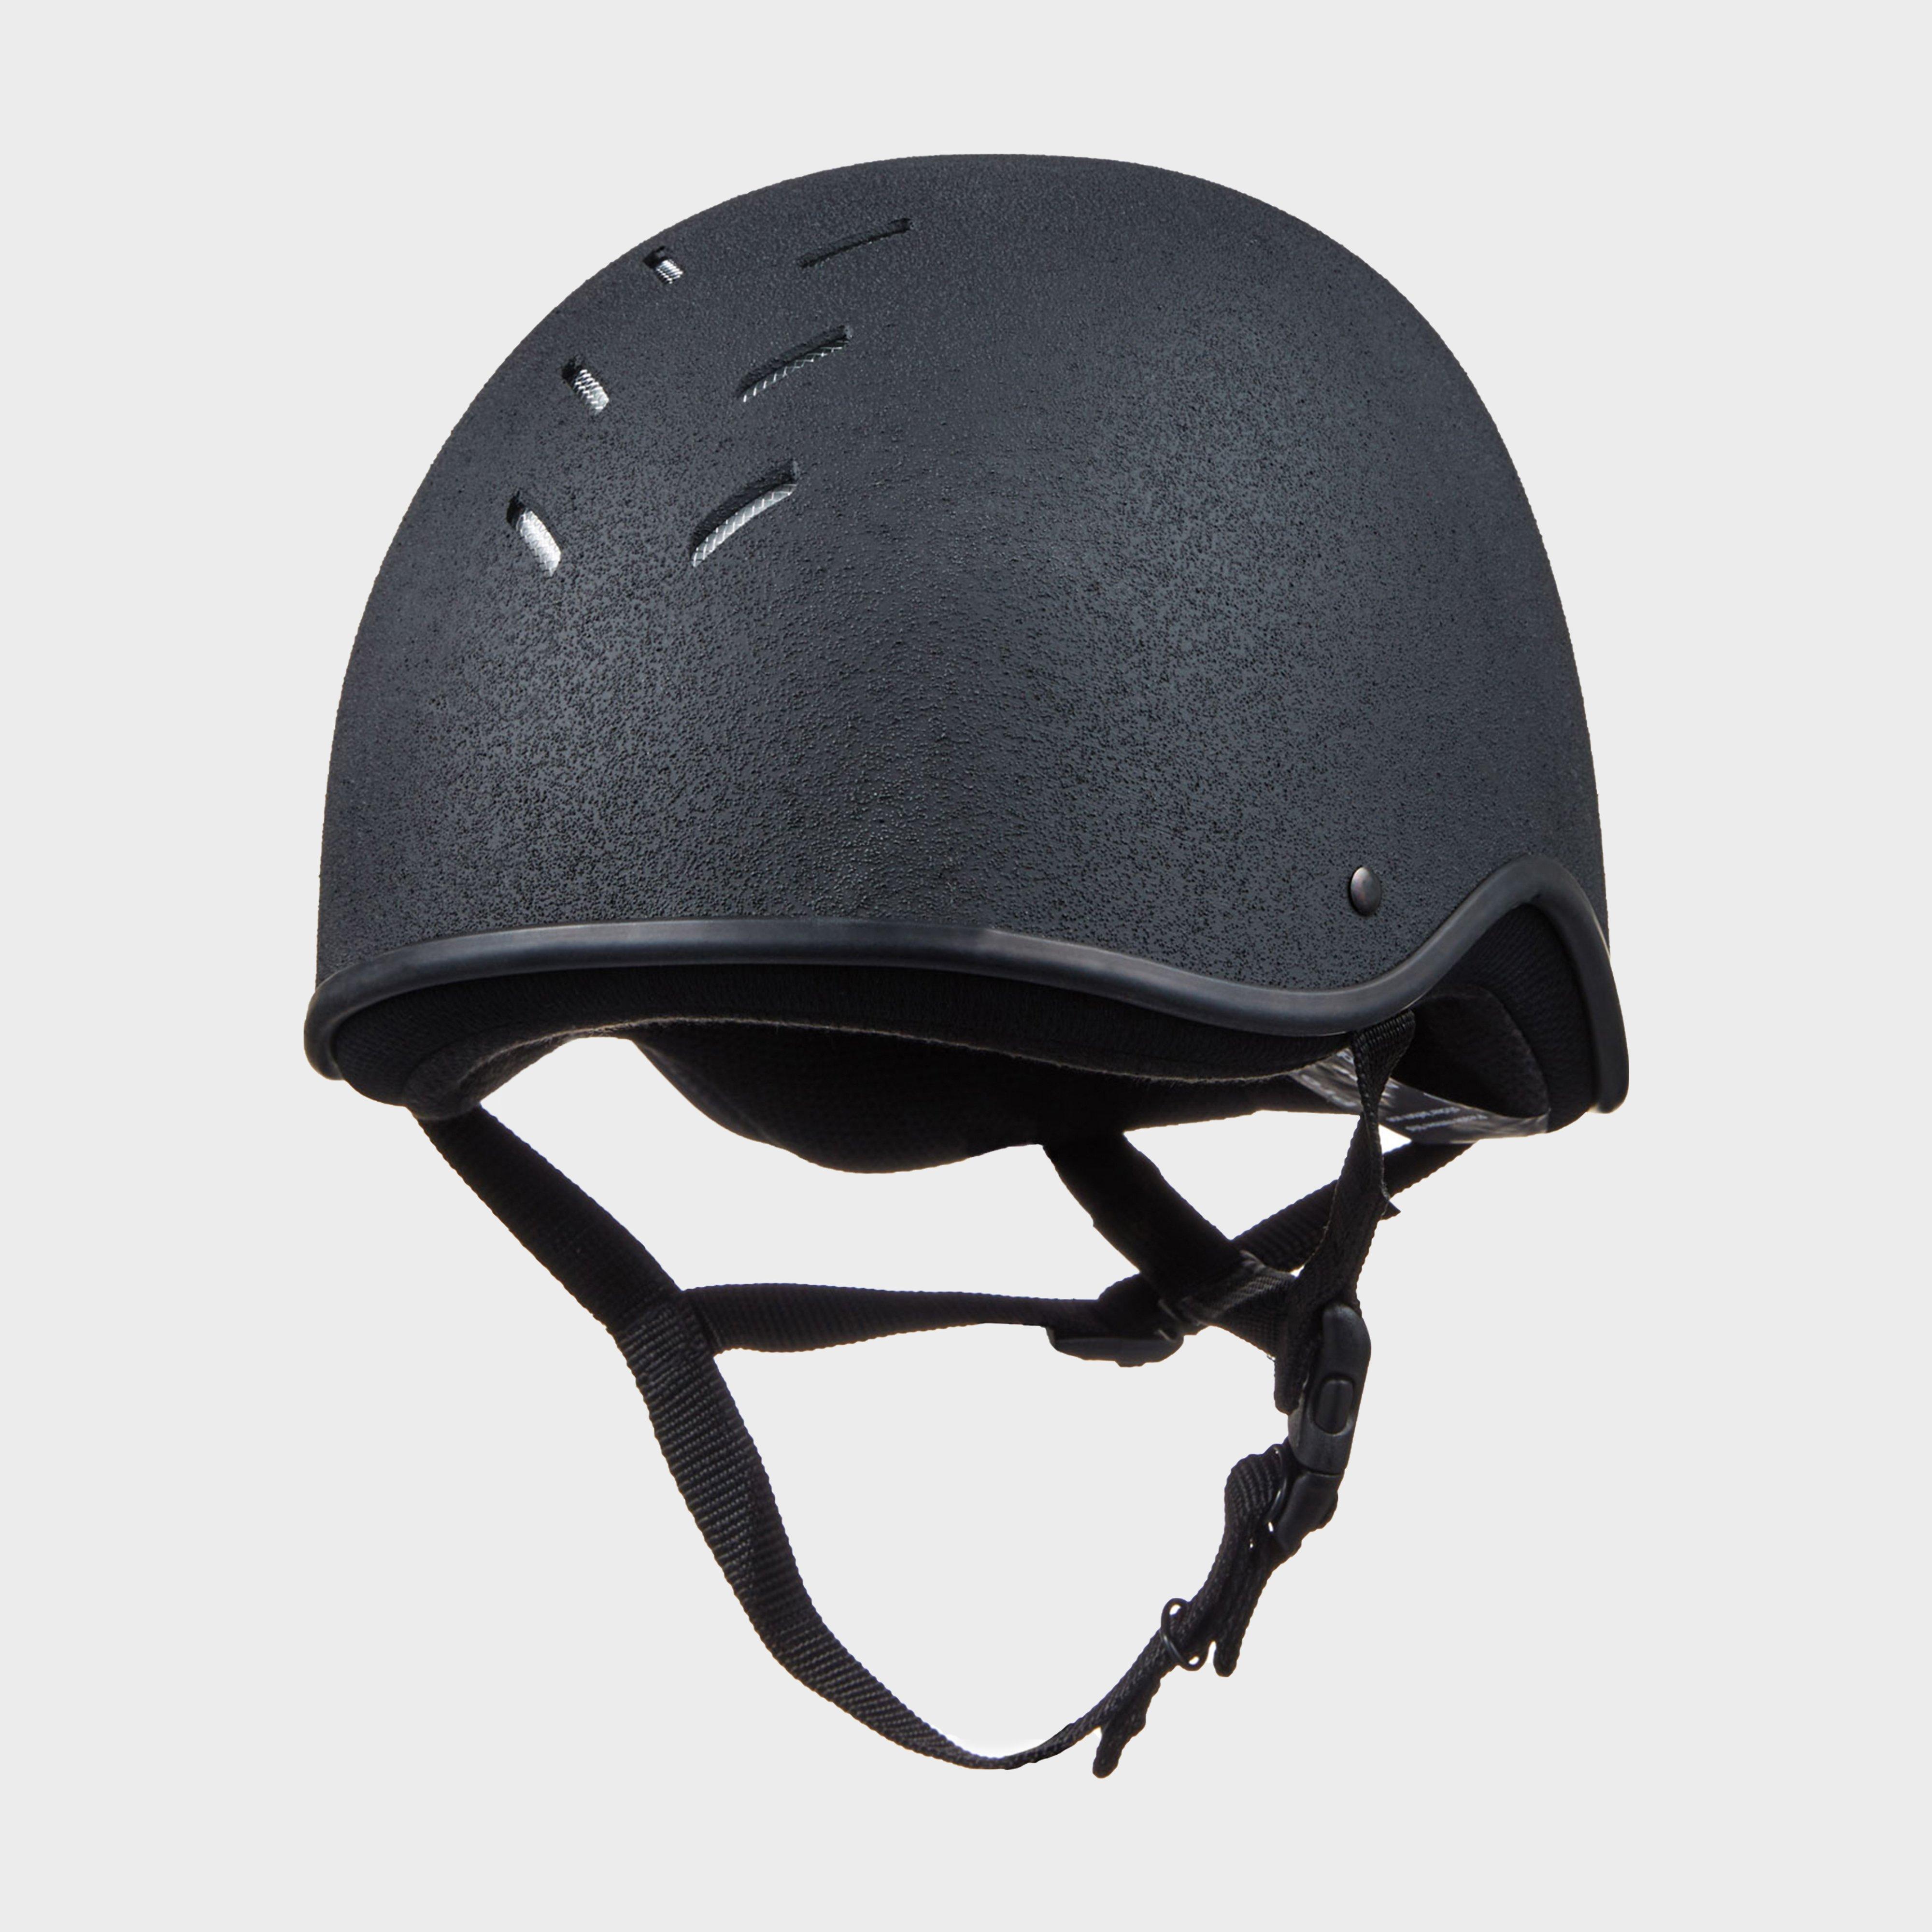 Charles Owen Adult's Js1 Riding Helmet - Black/Black, Black